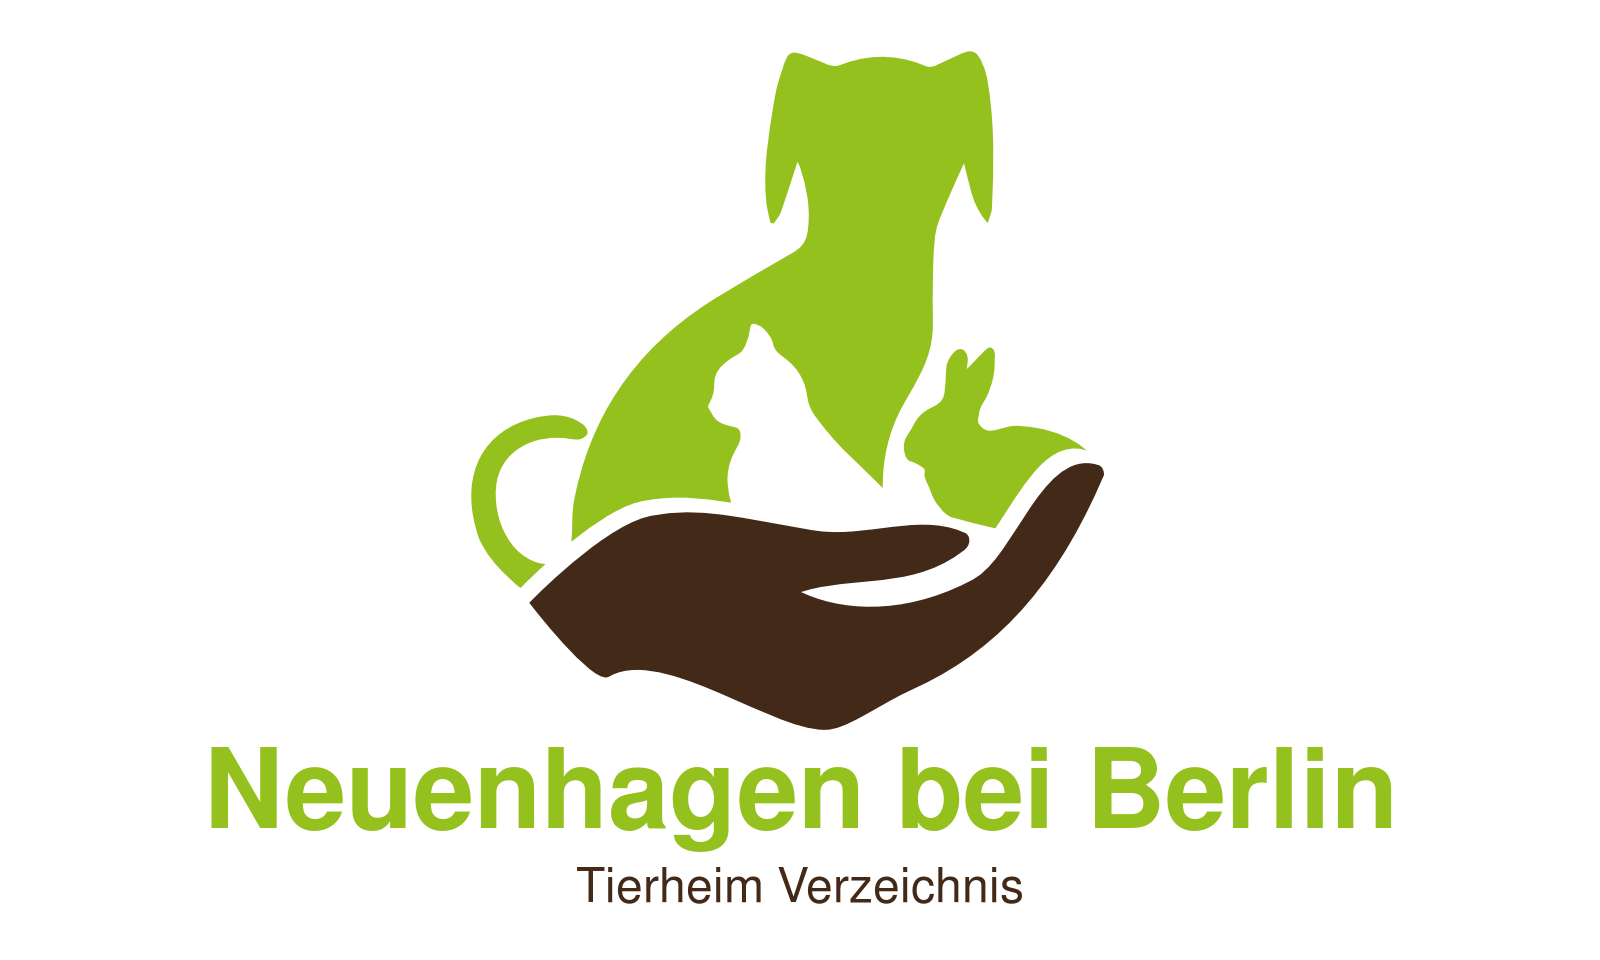 Tierheim Neuenhagen bei Berlin